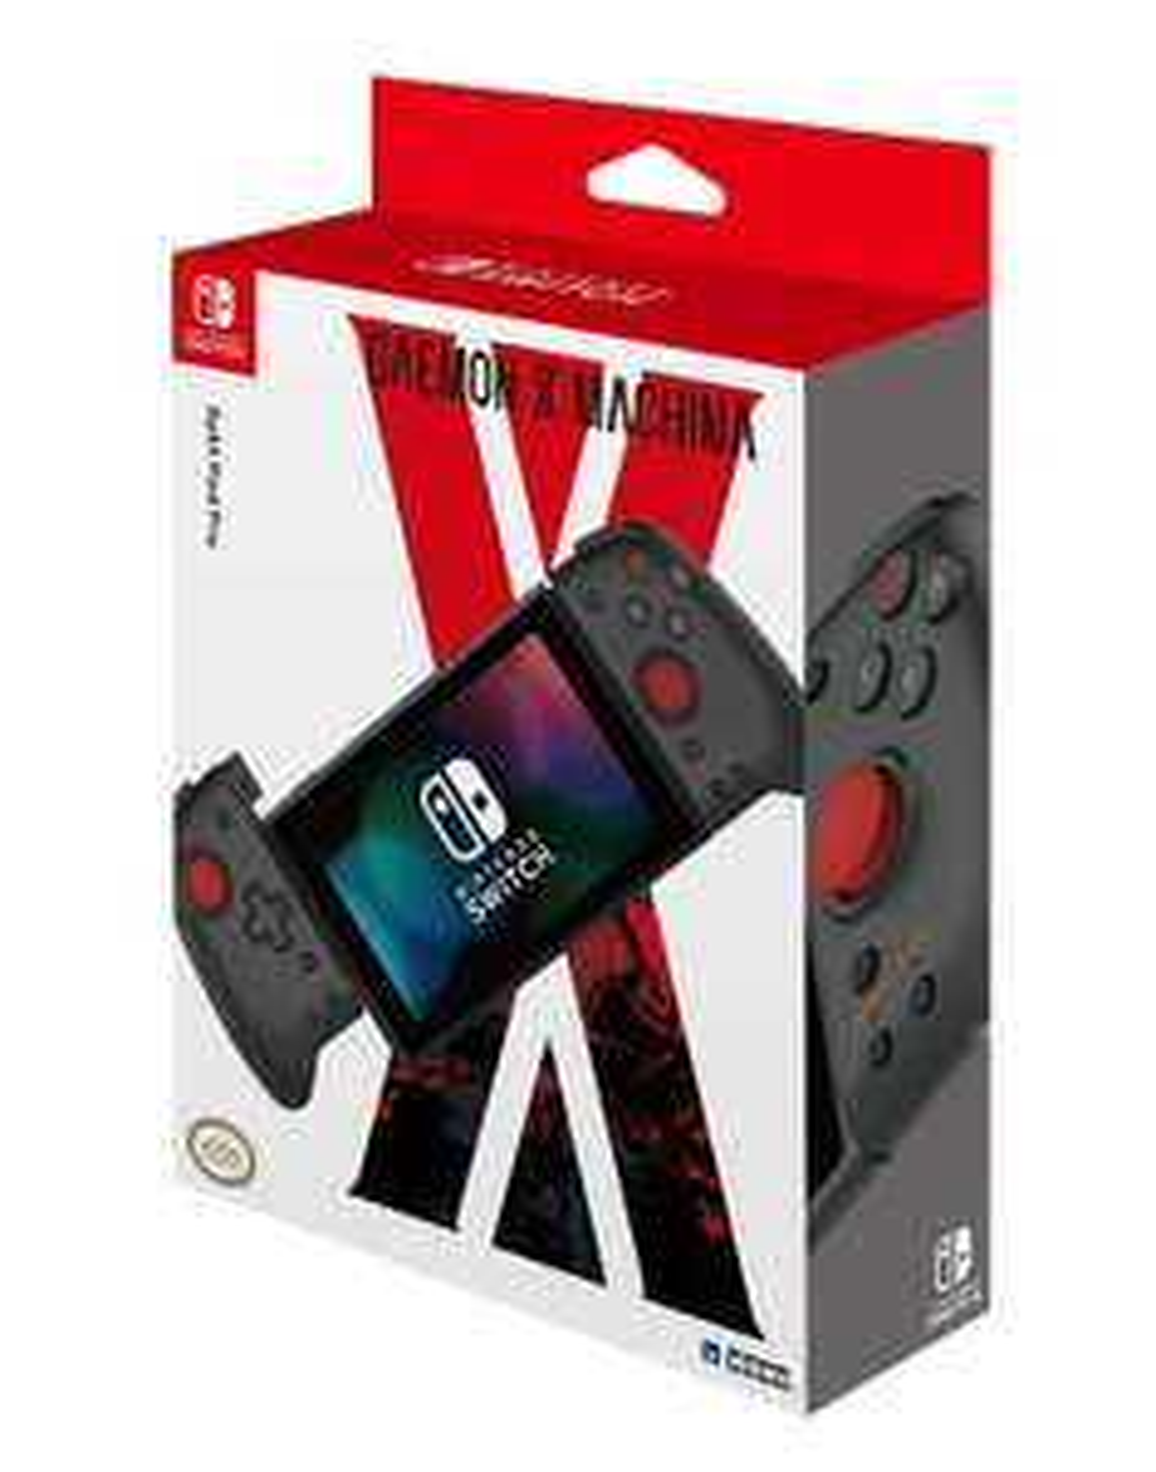 HORI Split Pad Pro - Daemon X Machina Edition for Nintendo Switch - £33.51 @ Amazon